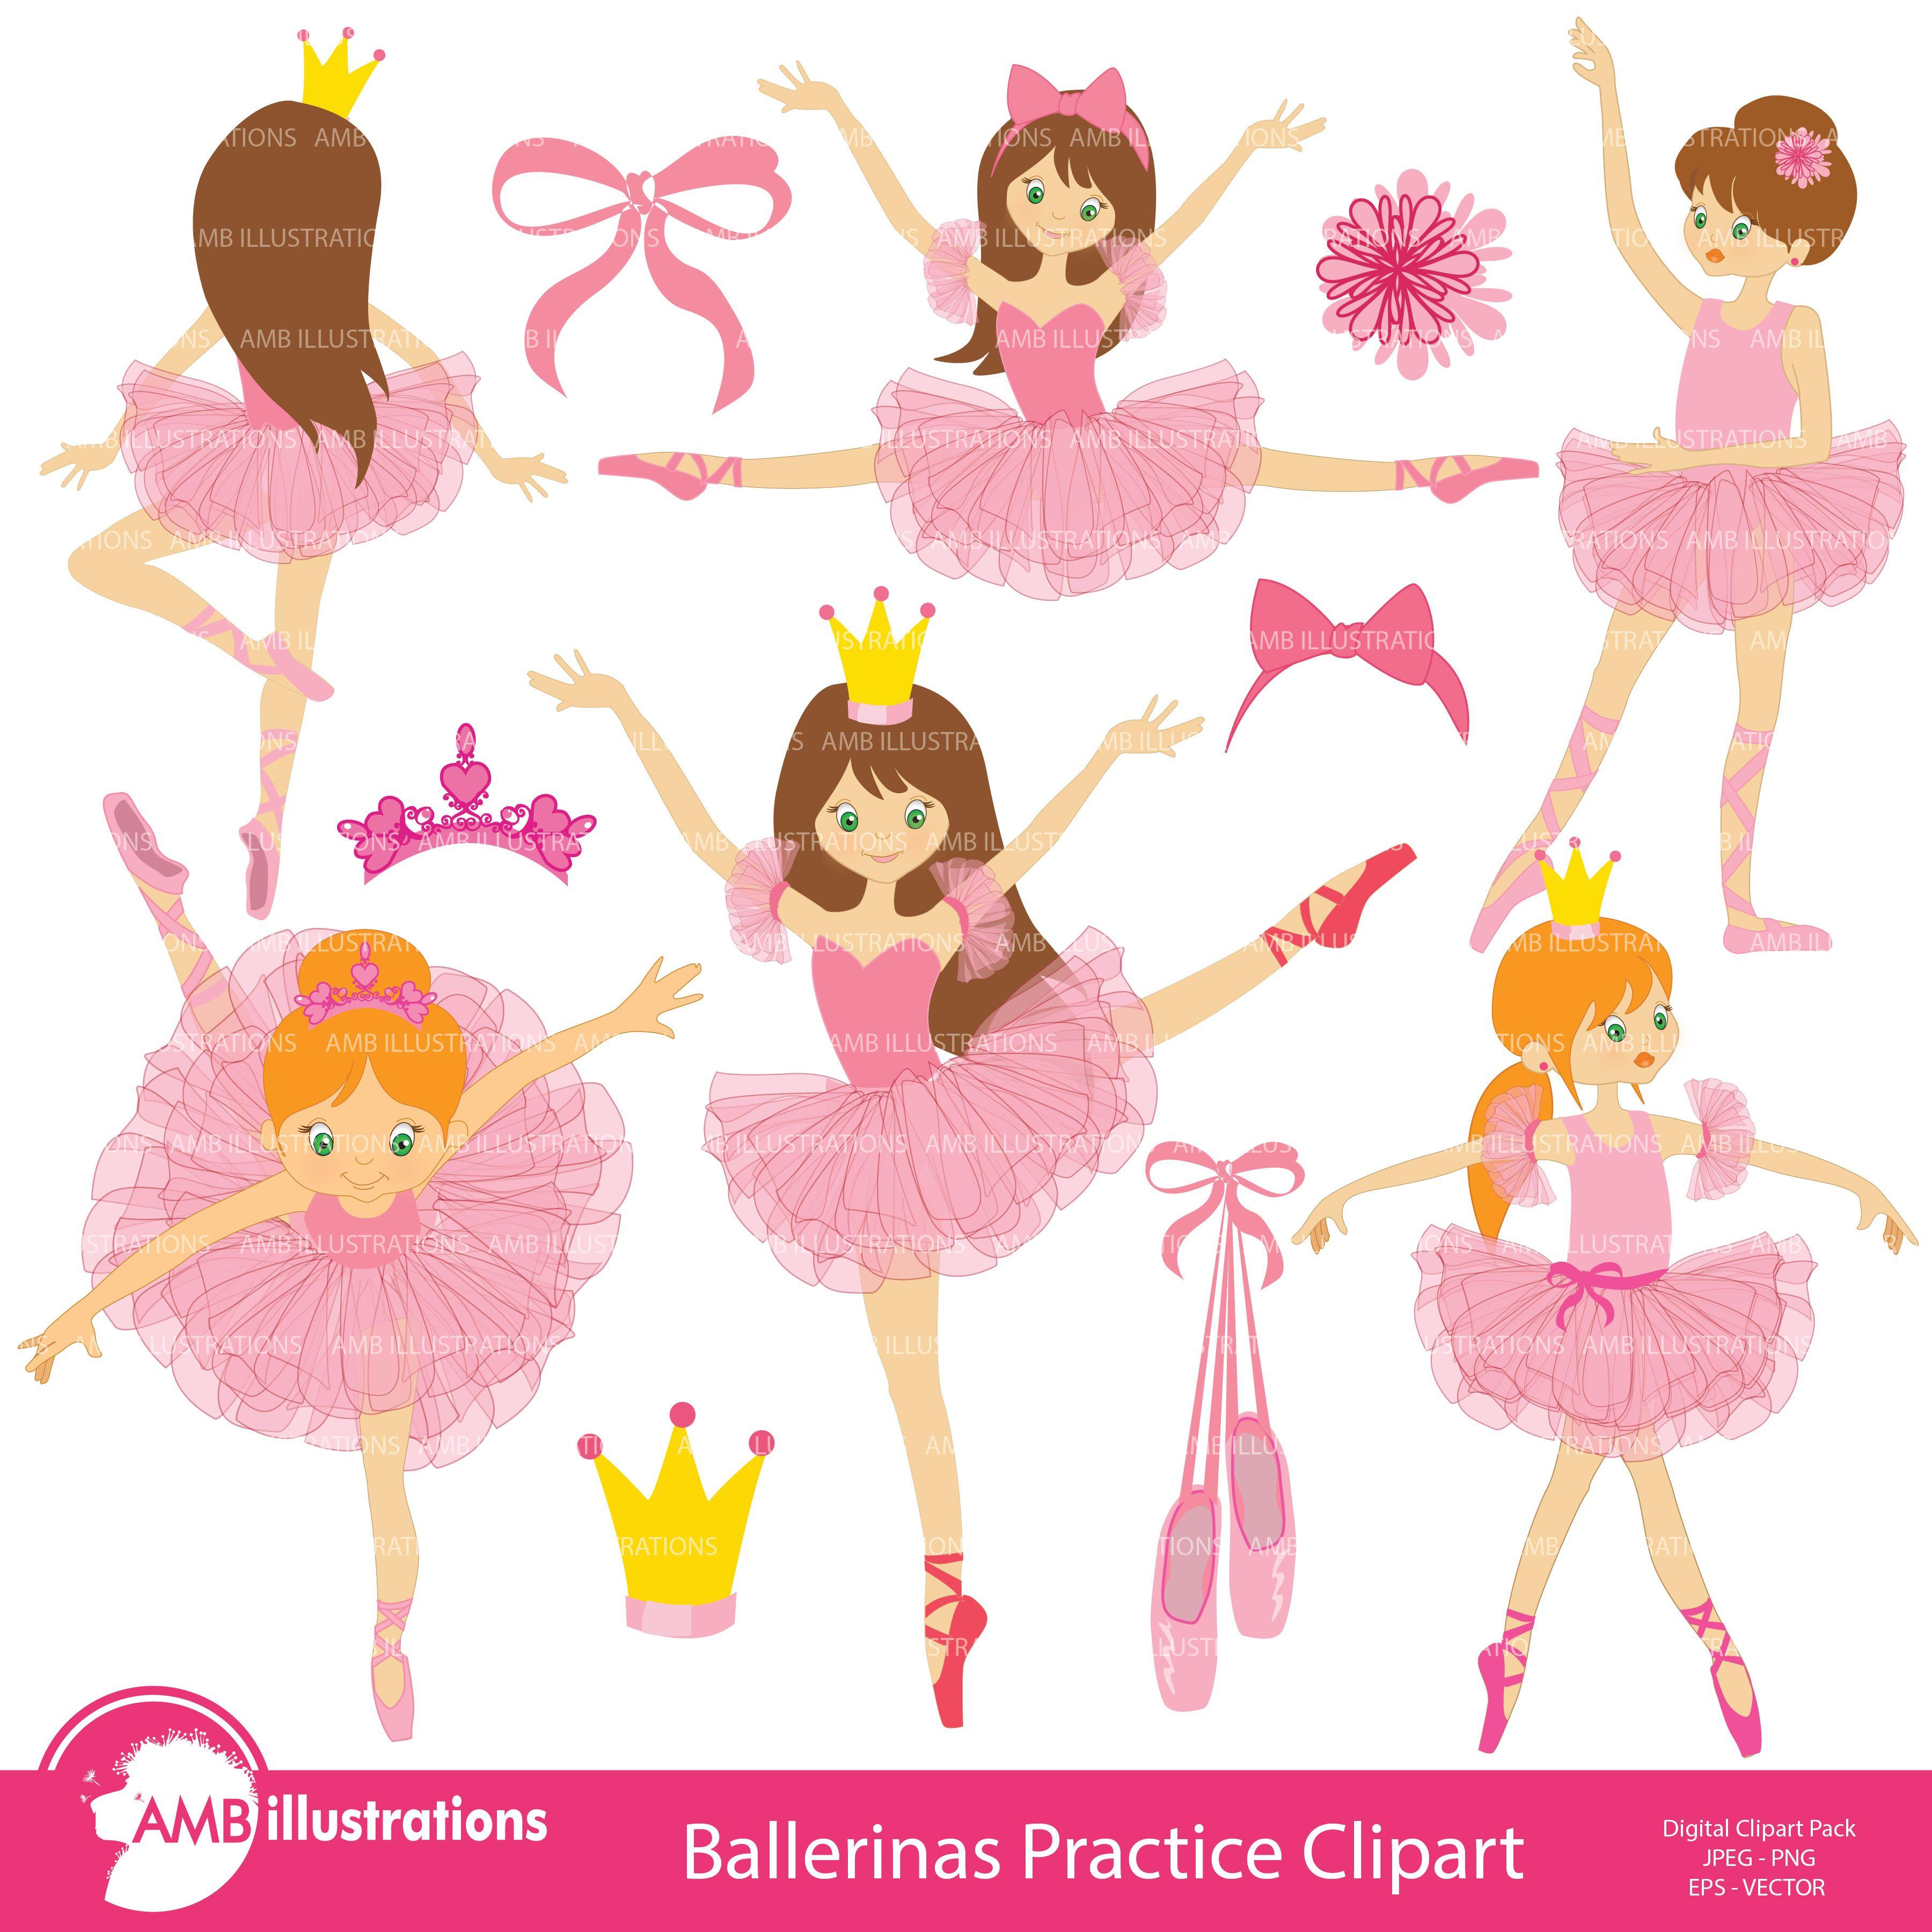 Ballerina Ballet Clipart AMB-232 by AMBillustrations on @creativemarket